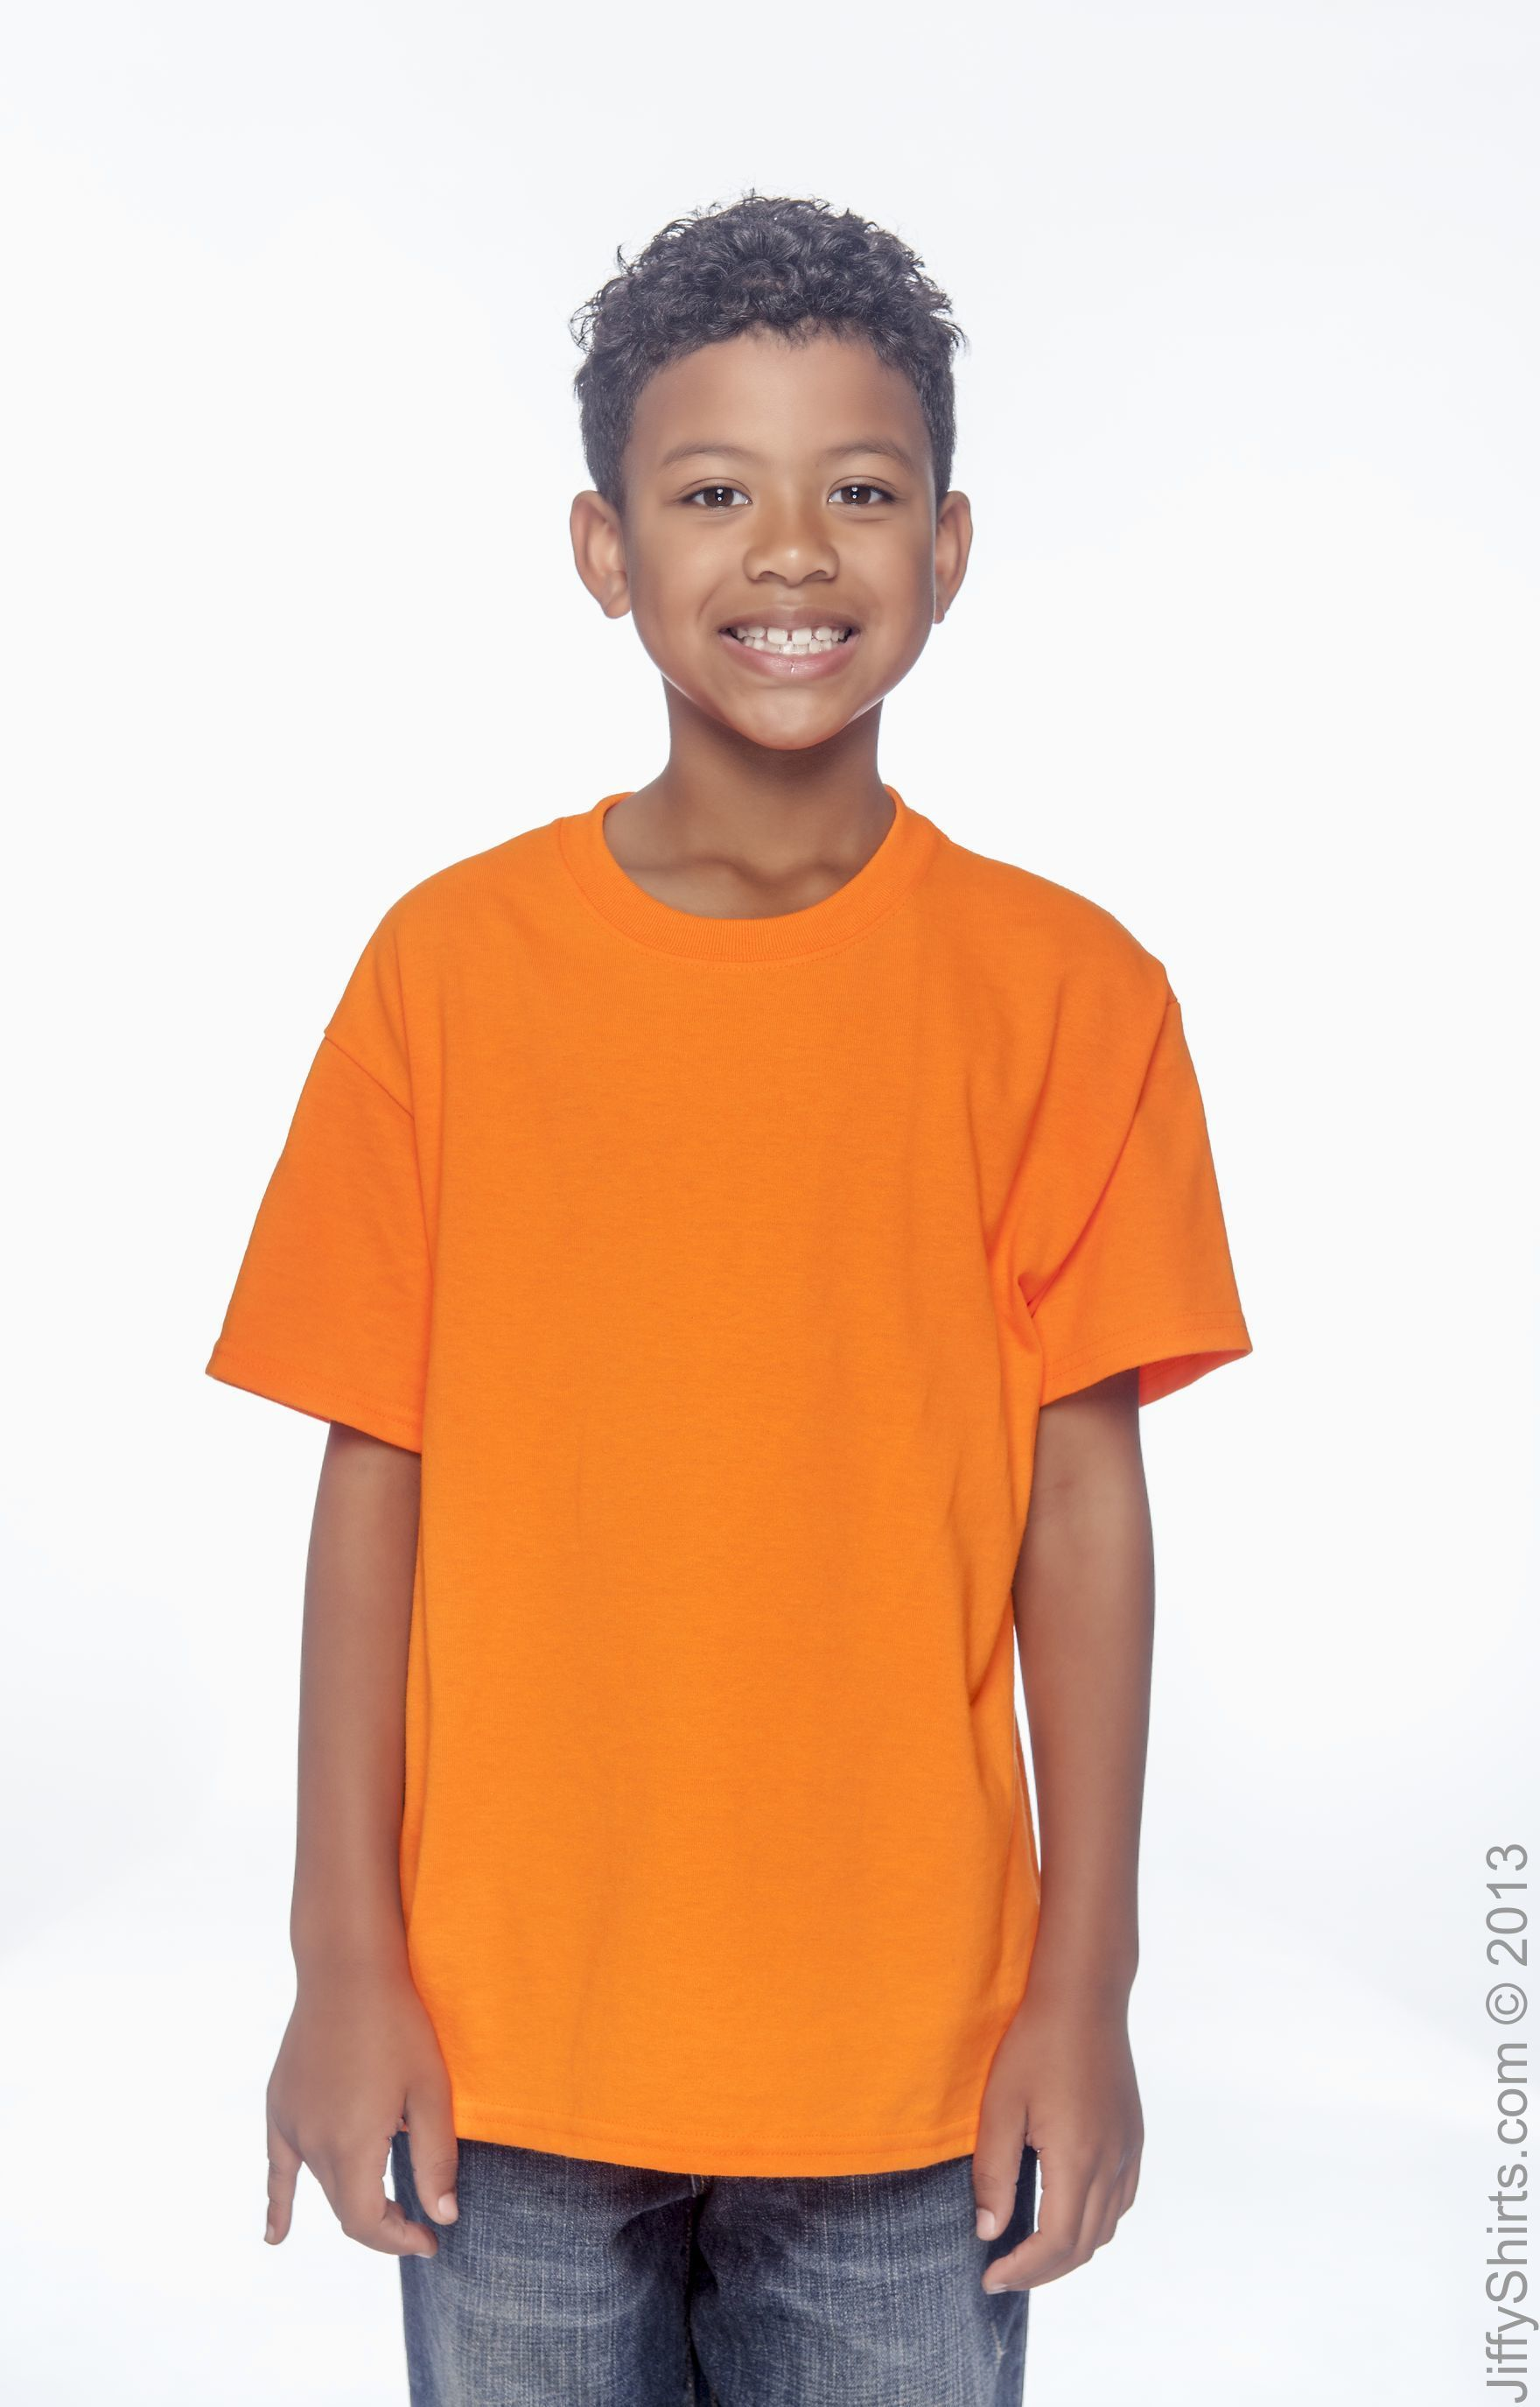 also gildan   youth ultra cotton oz  shirt jiffyshirts rh